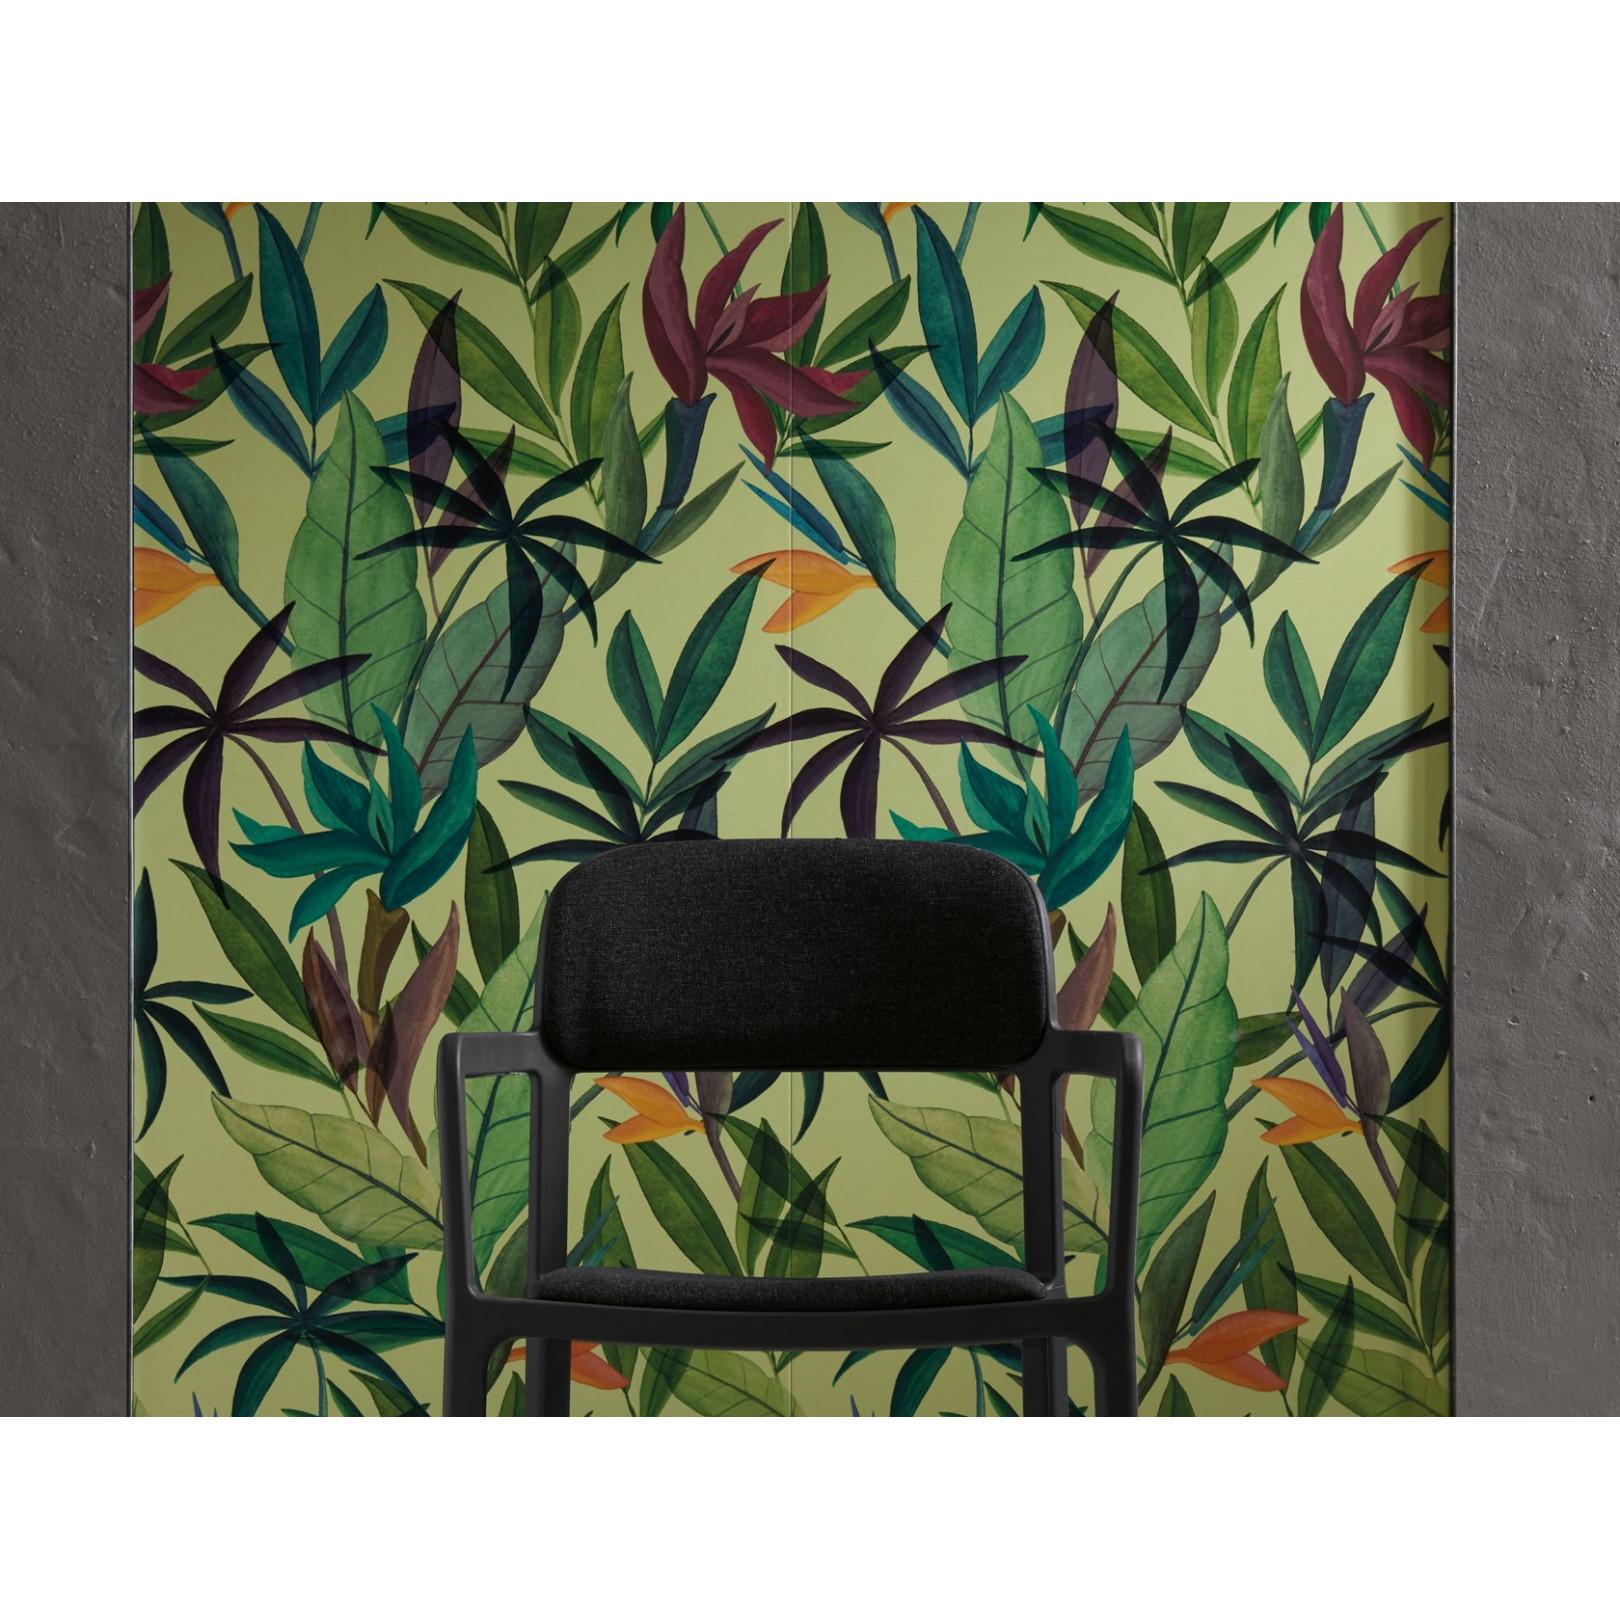 Carrelage grès cérame effet papier peint Scenari Leaf in Time